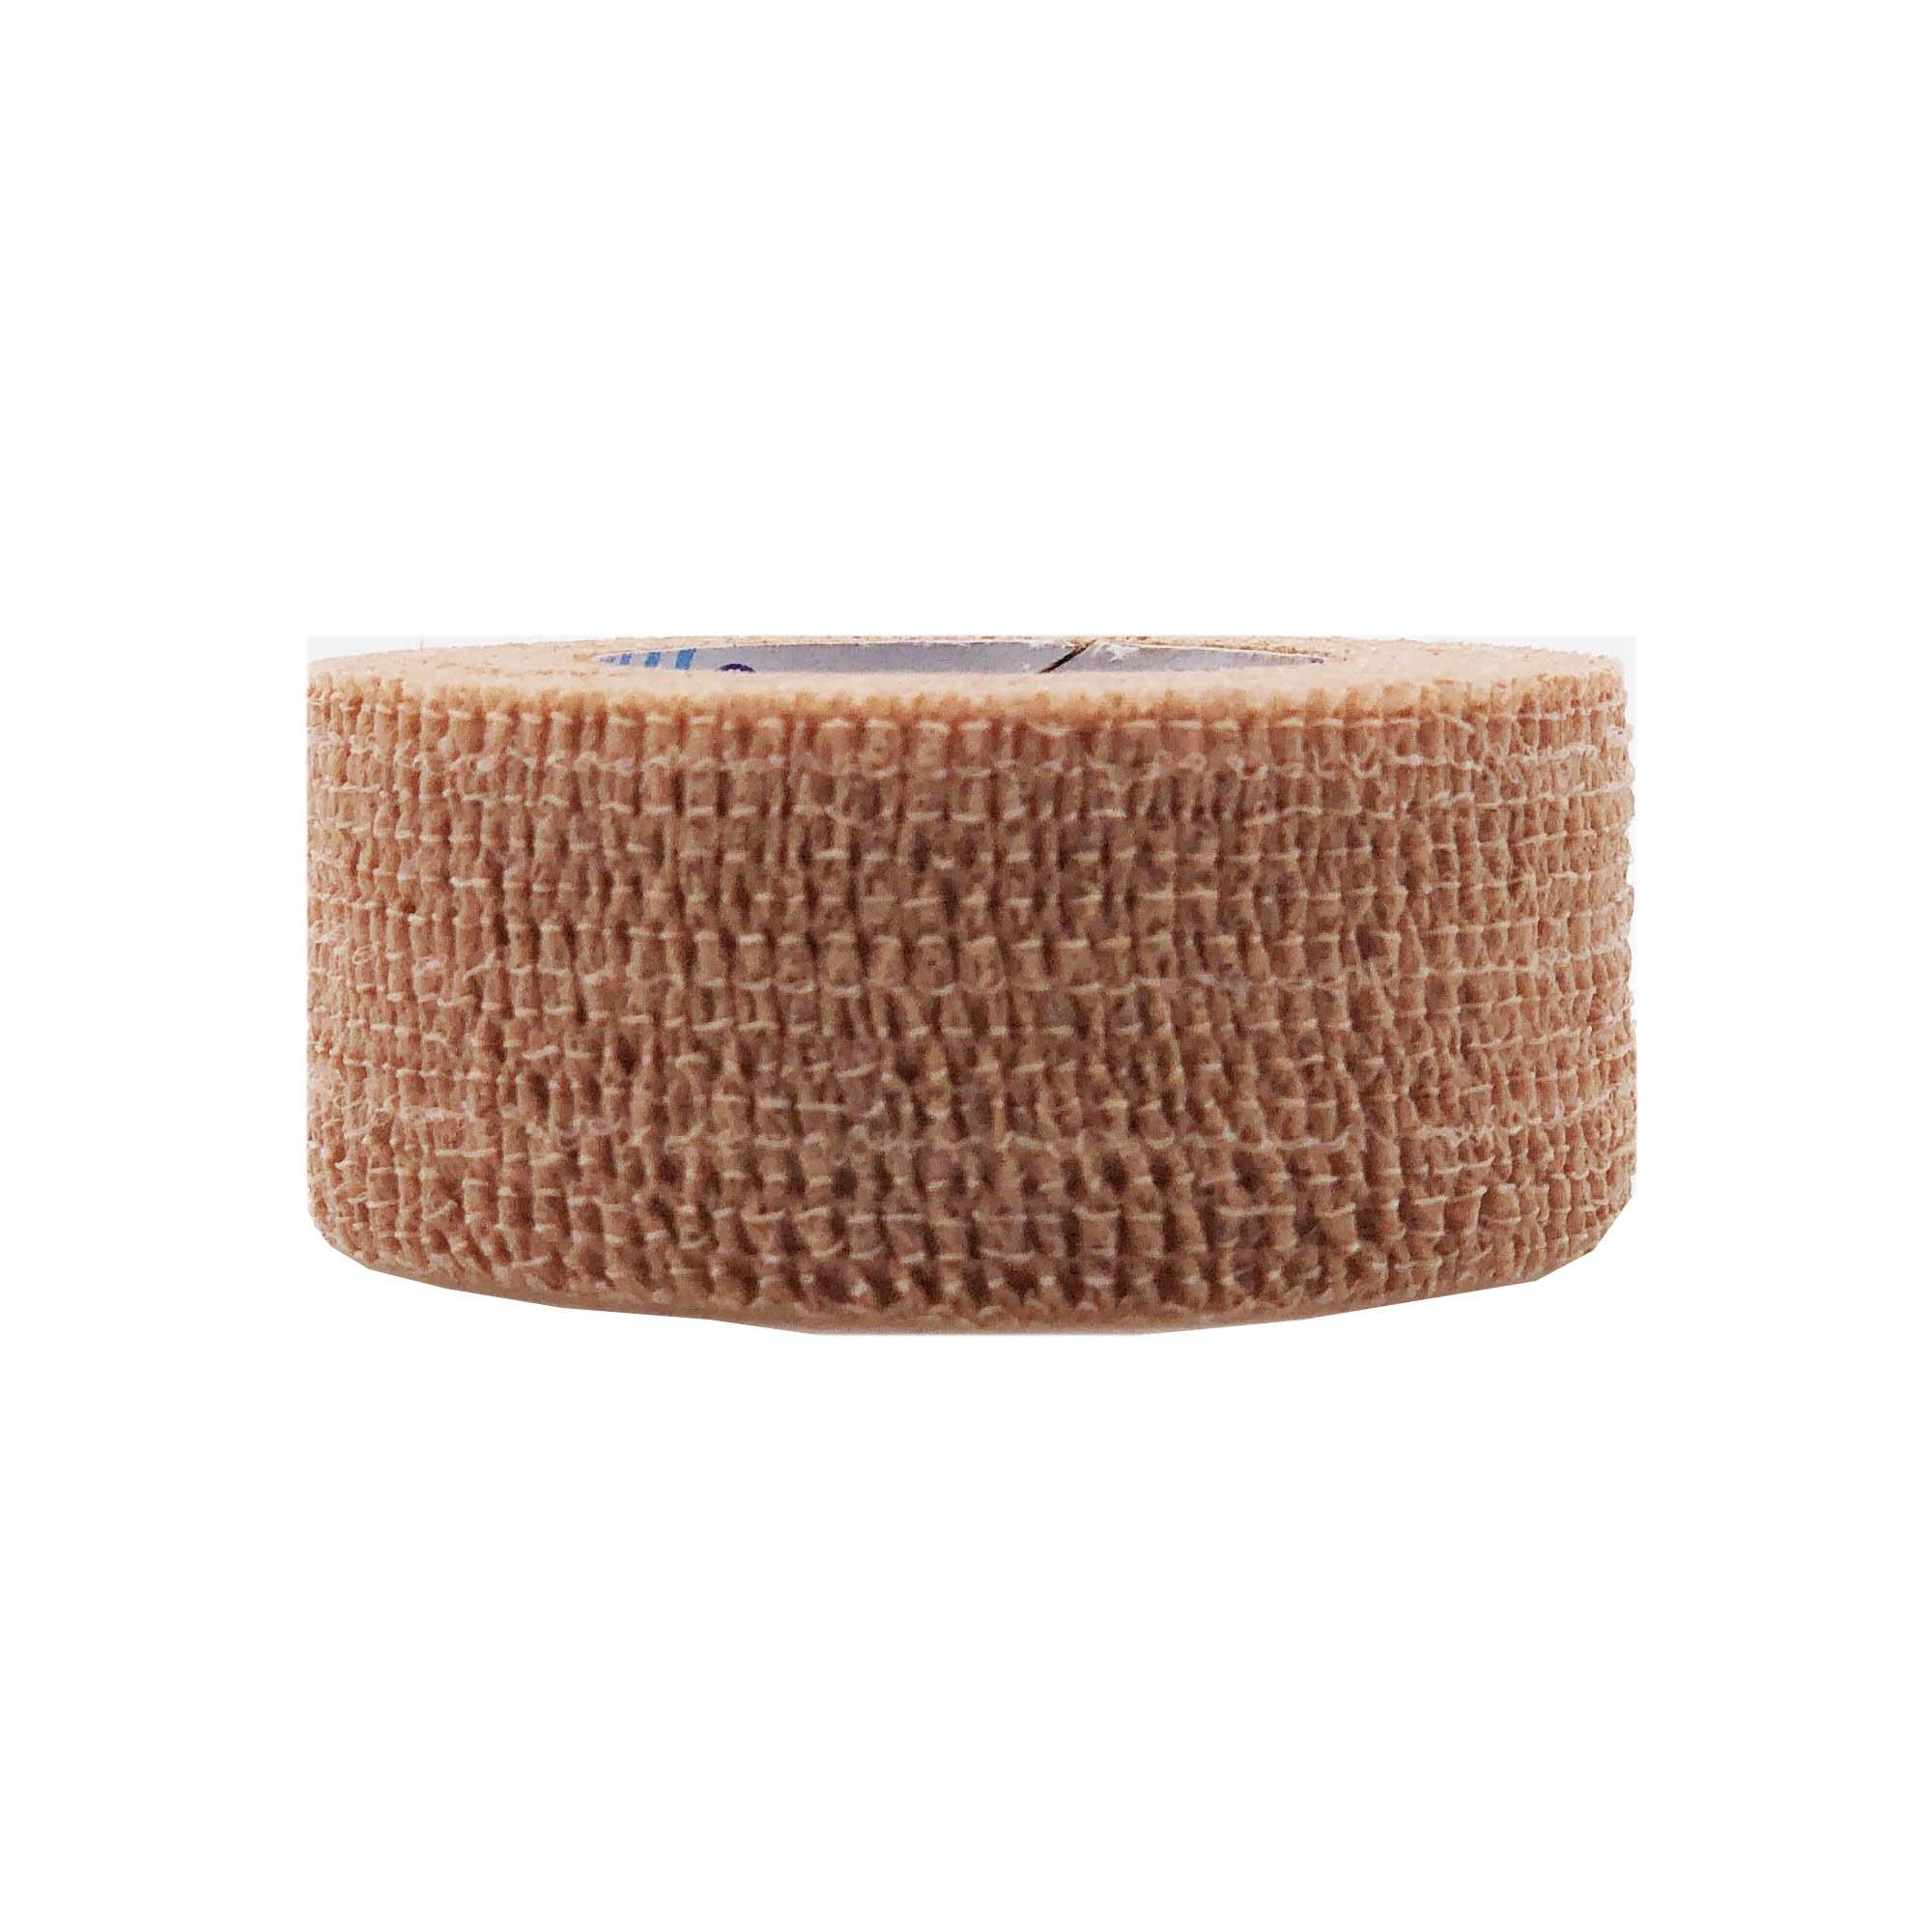 "CoFlex Med Cohesive Bandage, 1"" x 5 yds, 7100TN, Tan - Case of 30"